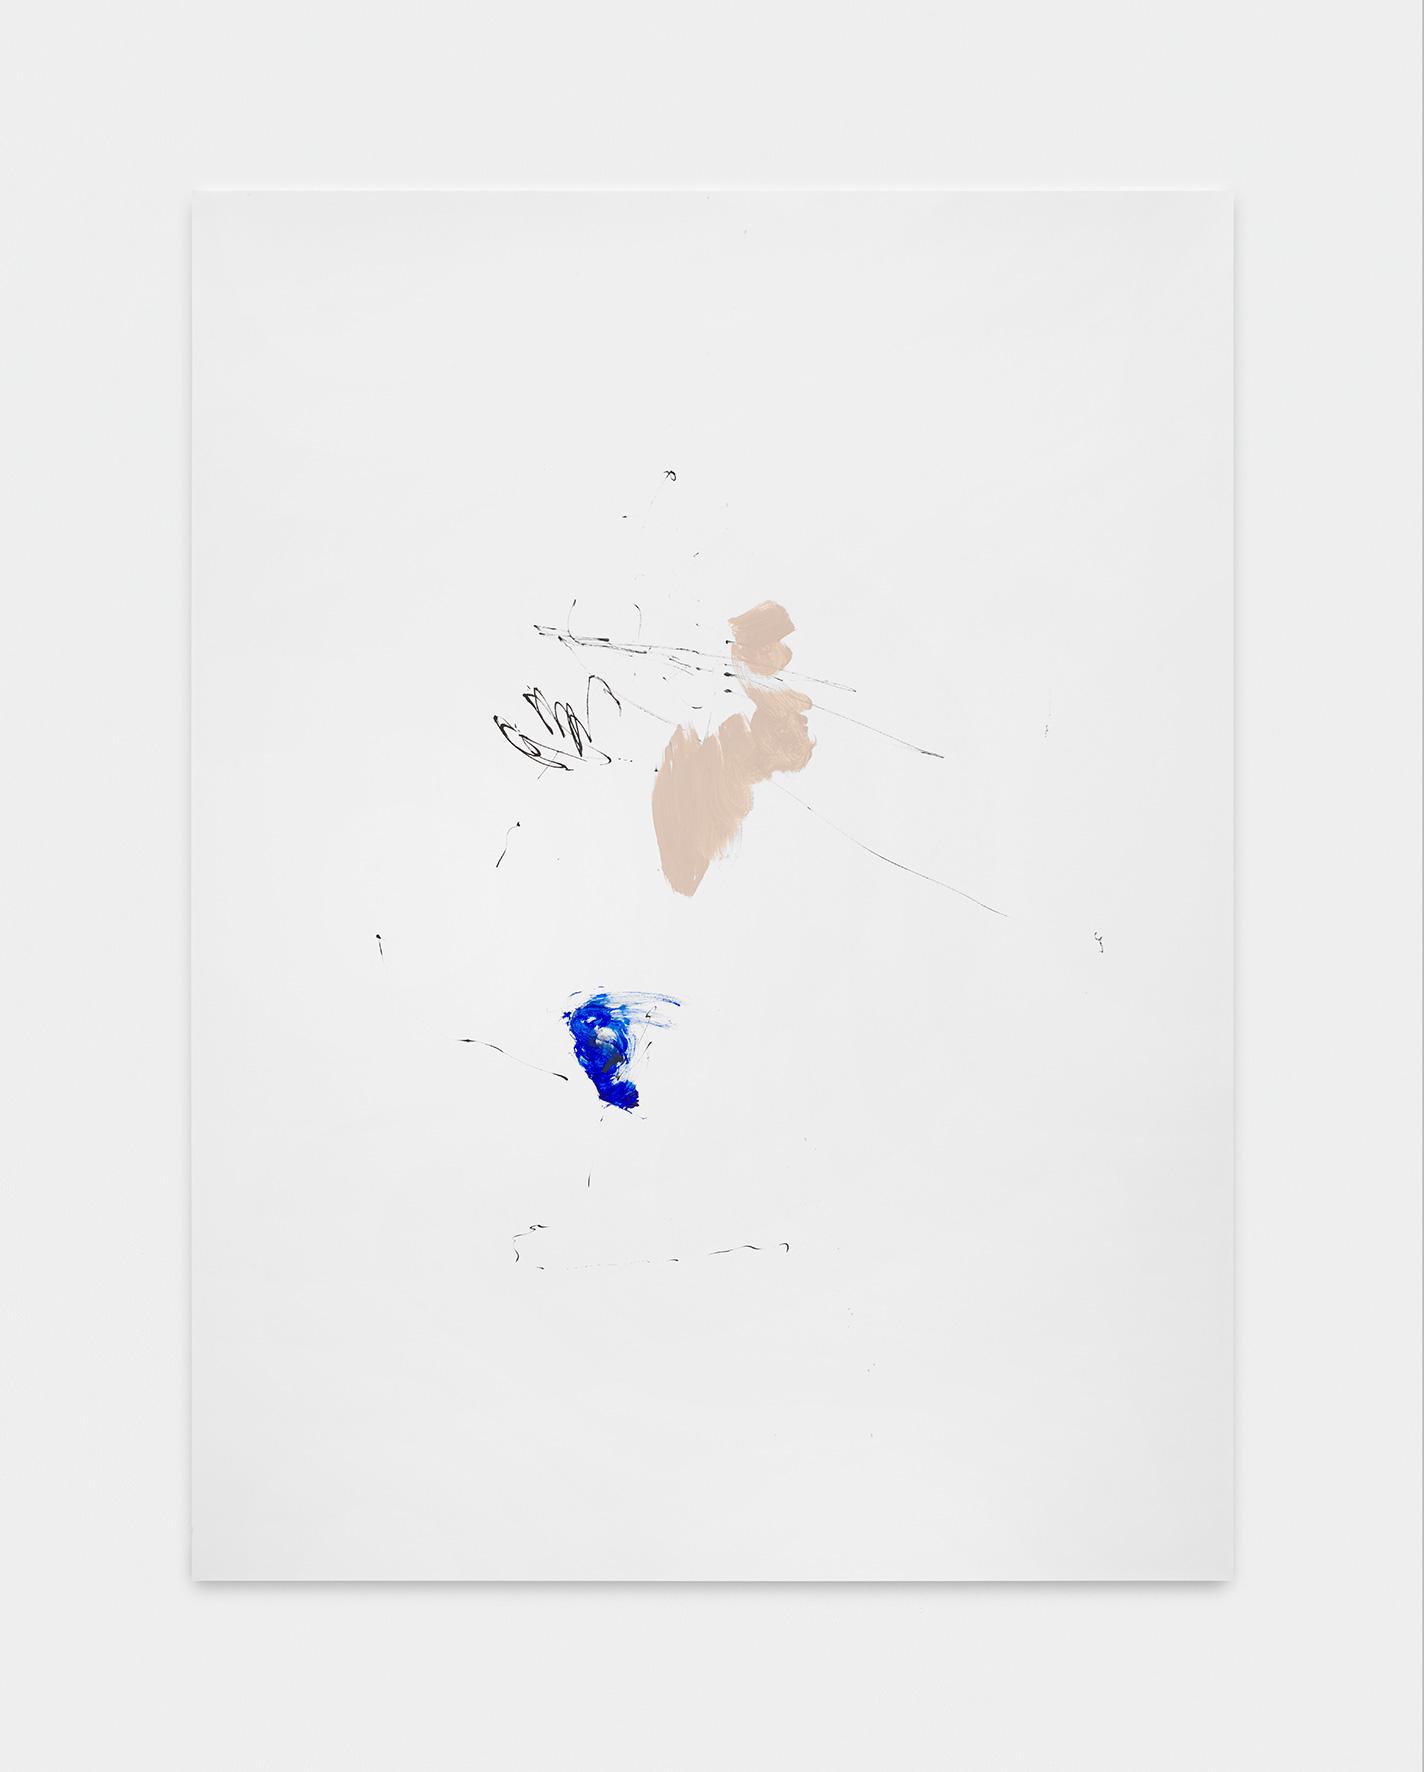 181220 | 2018 | Acryl, Lack, Tusche auf Leinwand | 200 x 150cm | ©GALERIE ALBER